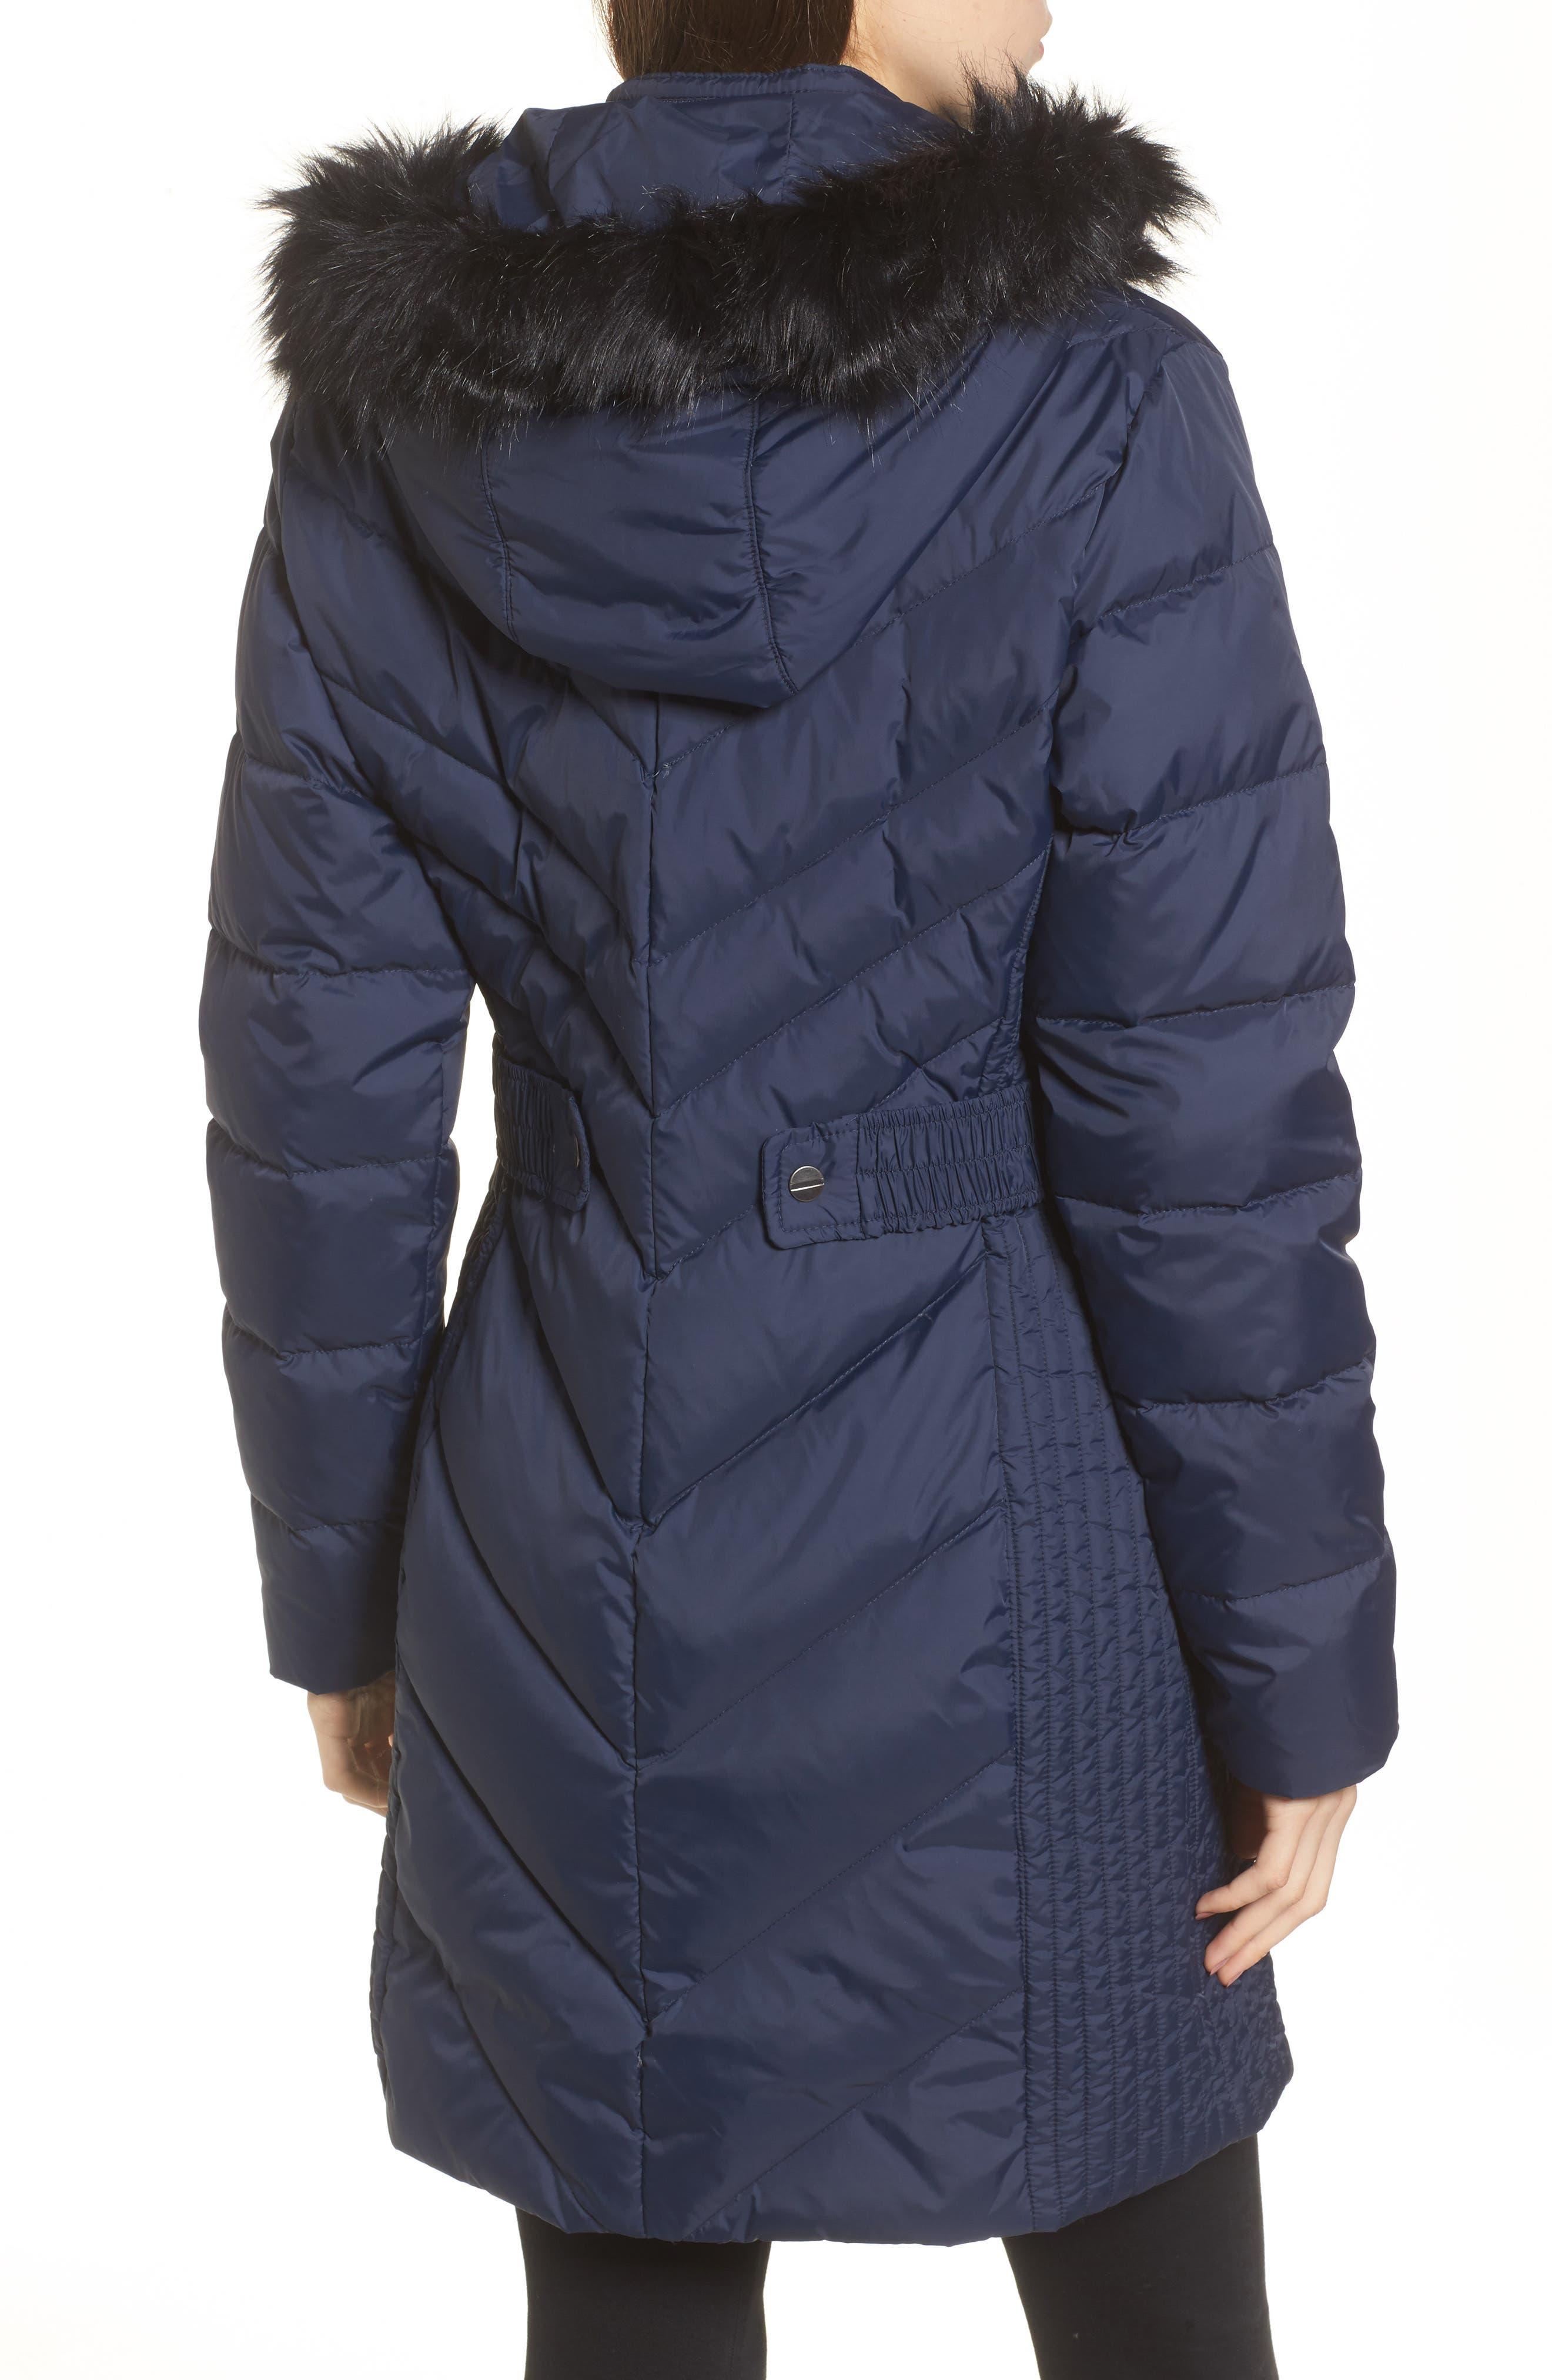 Faux Fur Trim Hooded Jacket,                             Alternate thumbnail 2, color,                             004